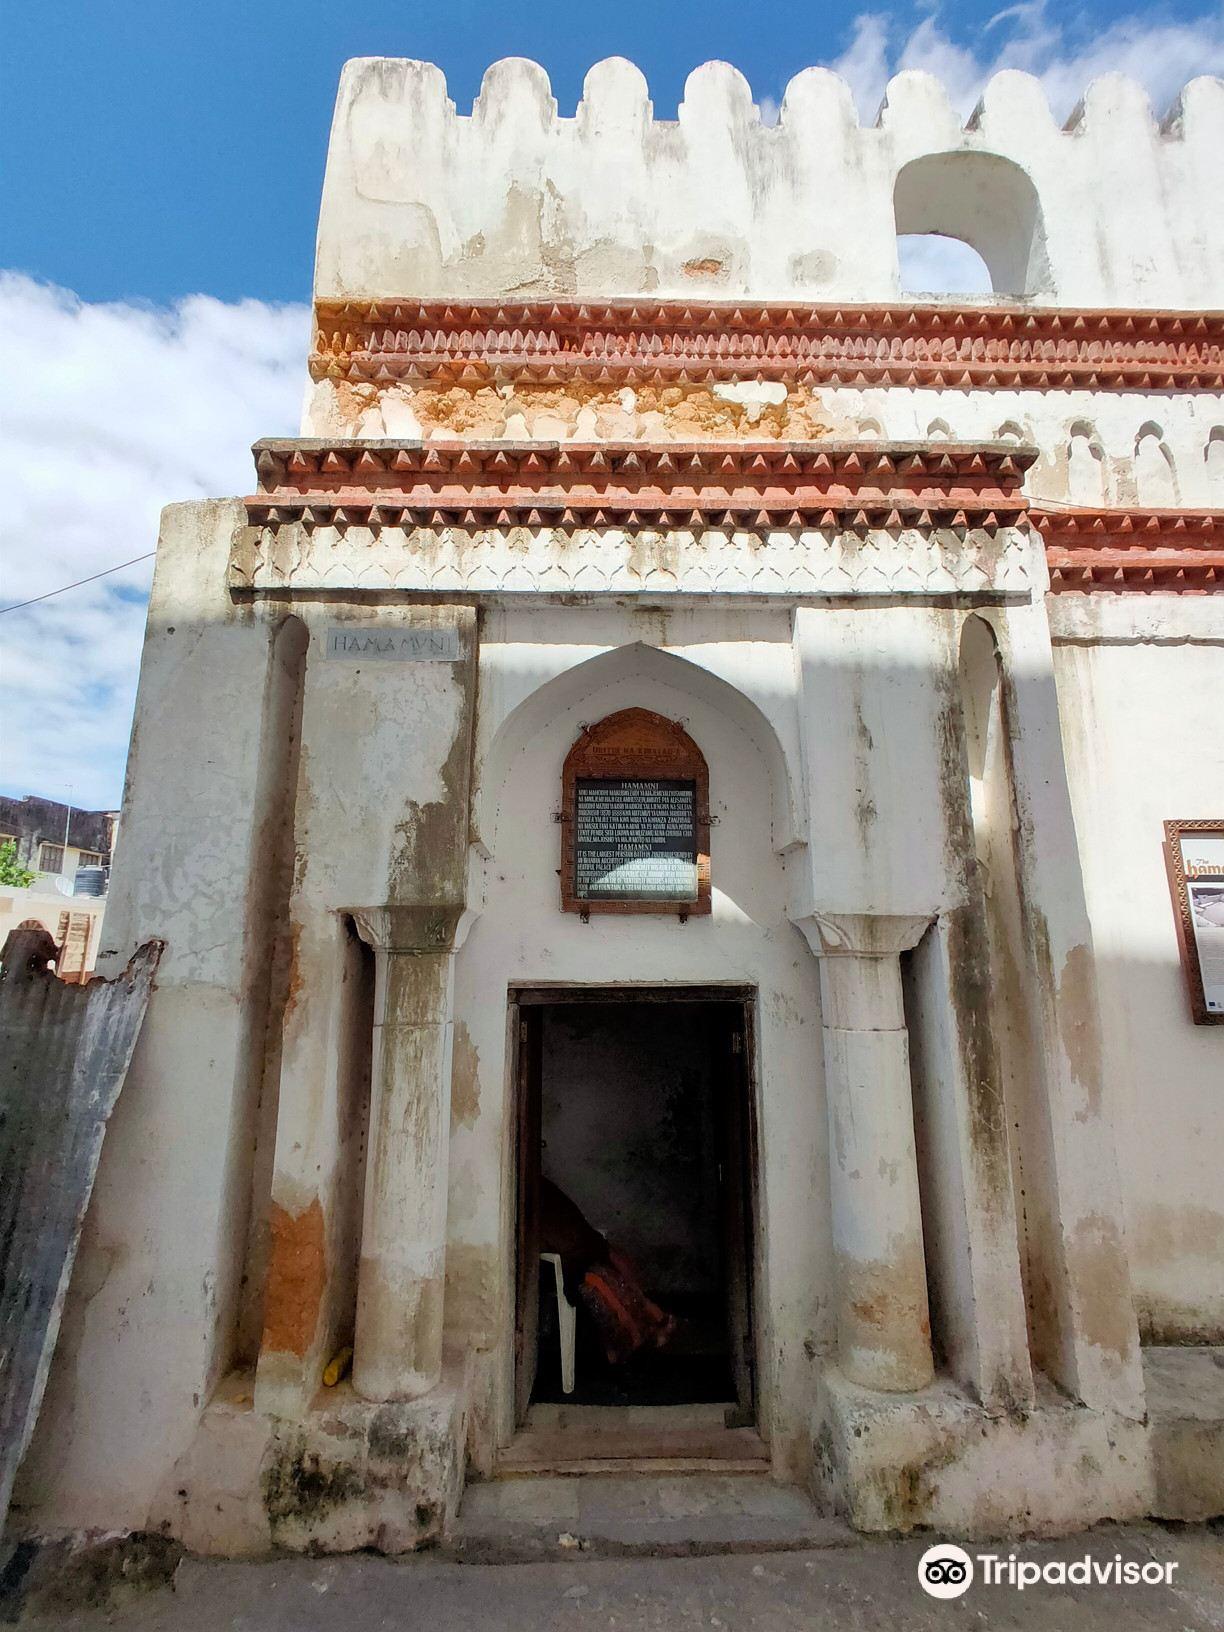 Hamamni Persian Baths